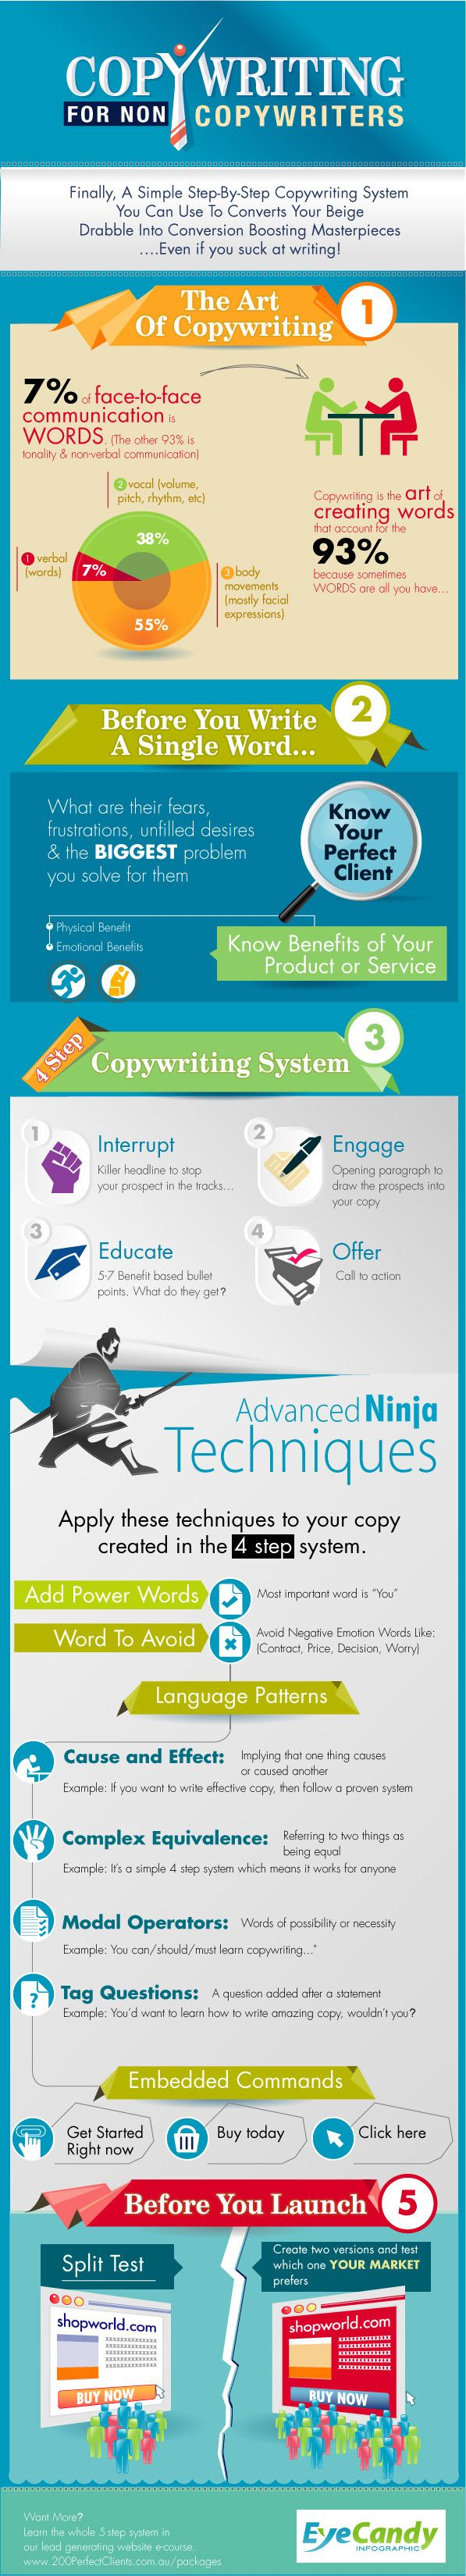 Copy Writing for Non Copywriters | #Copywriting #ContentMarketing #infographic